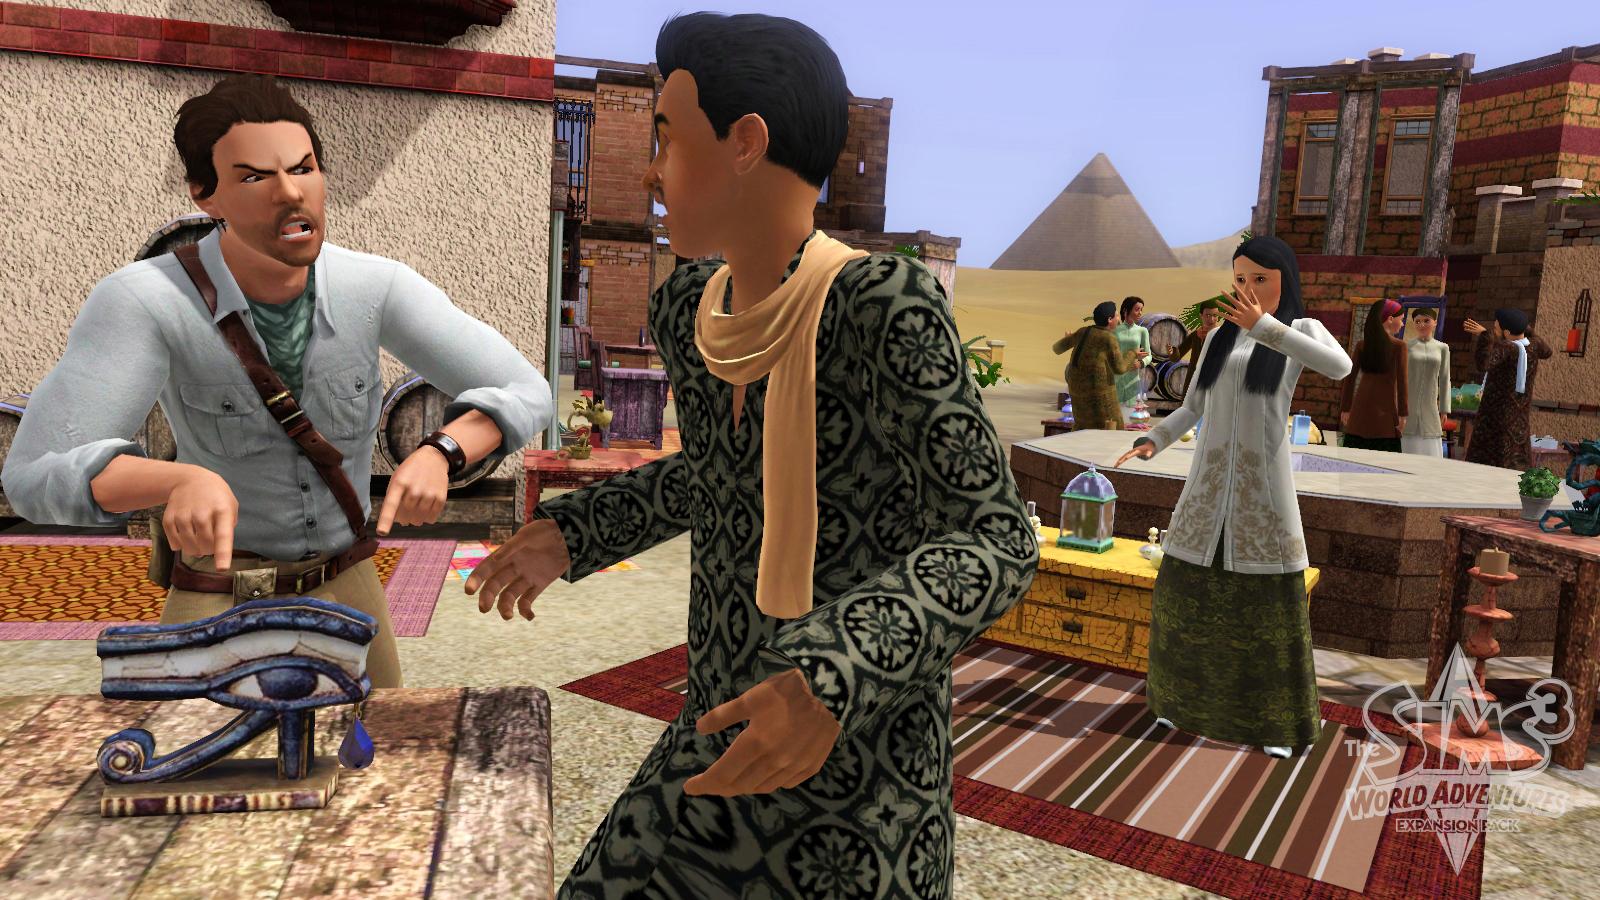 Les Sims 3: Destination Aventure (Win - Mac) - Image 2